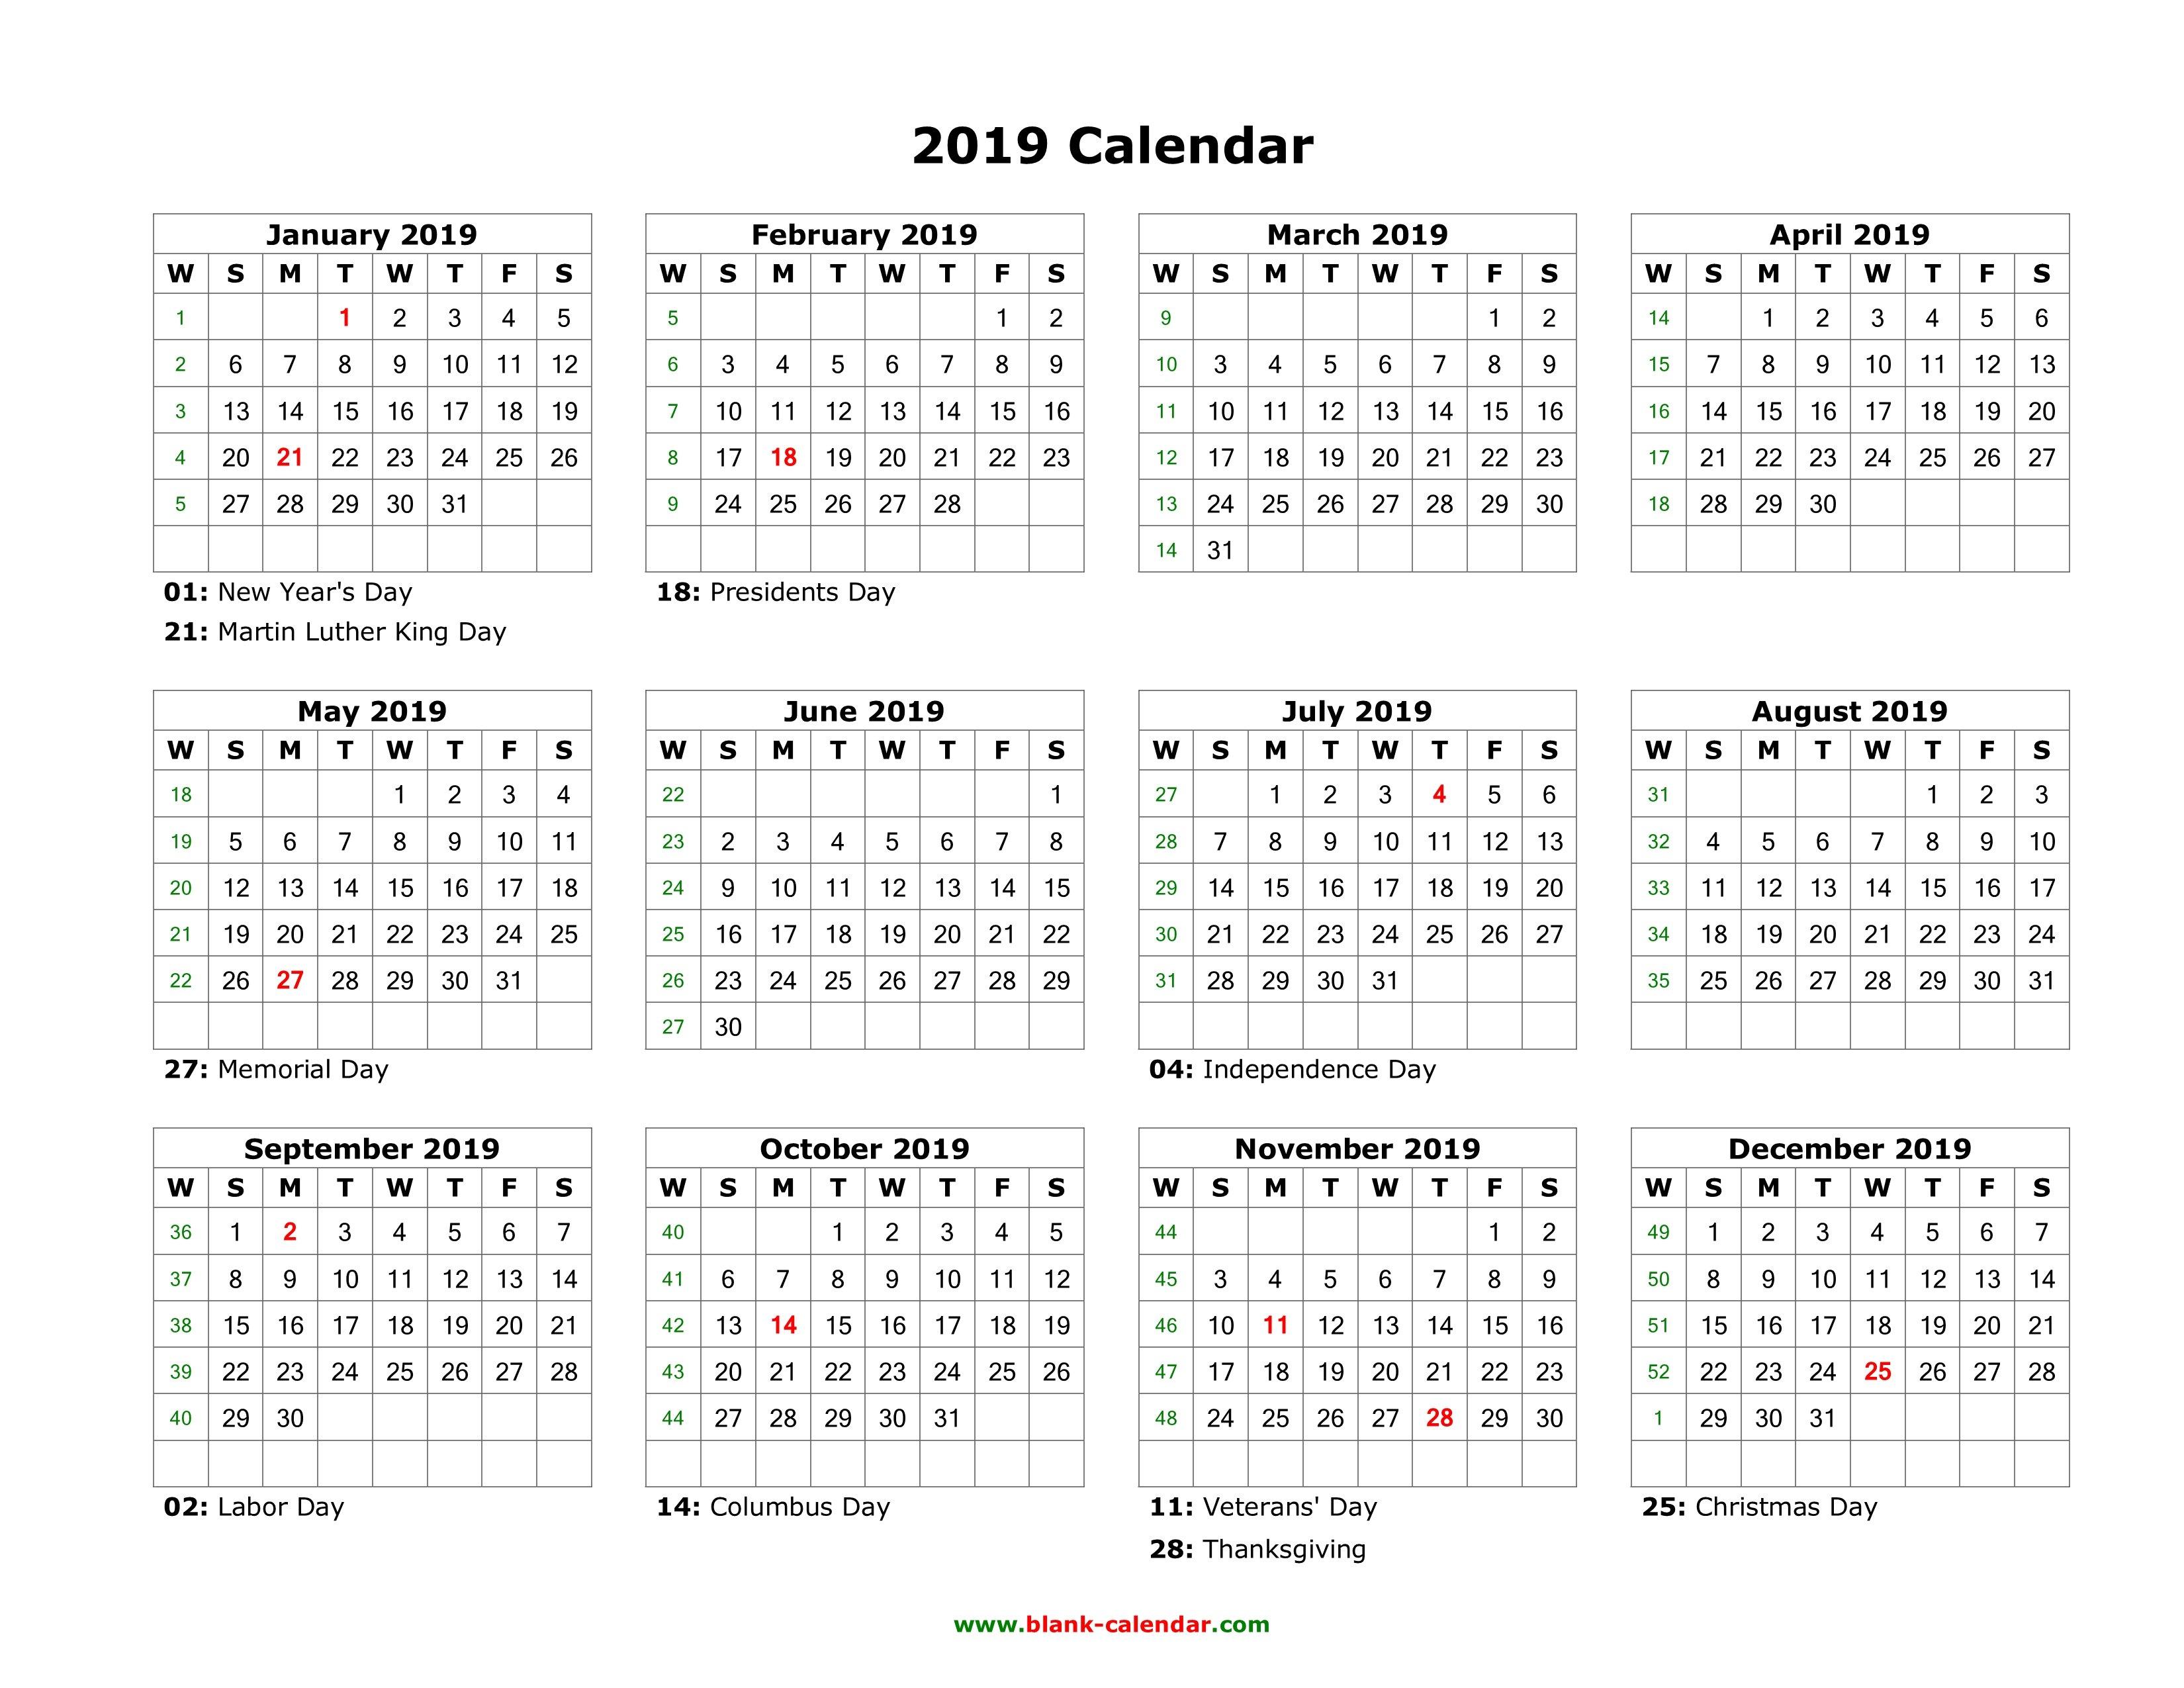 Blank Calendar 2019   Free Download Calendar Templates Calendar 2019 Full Year